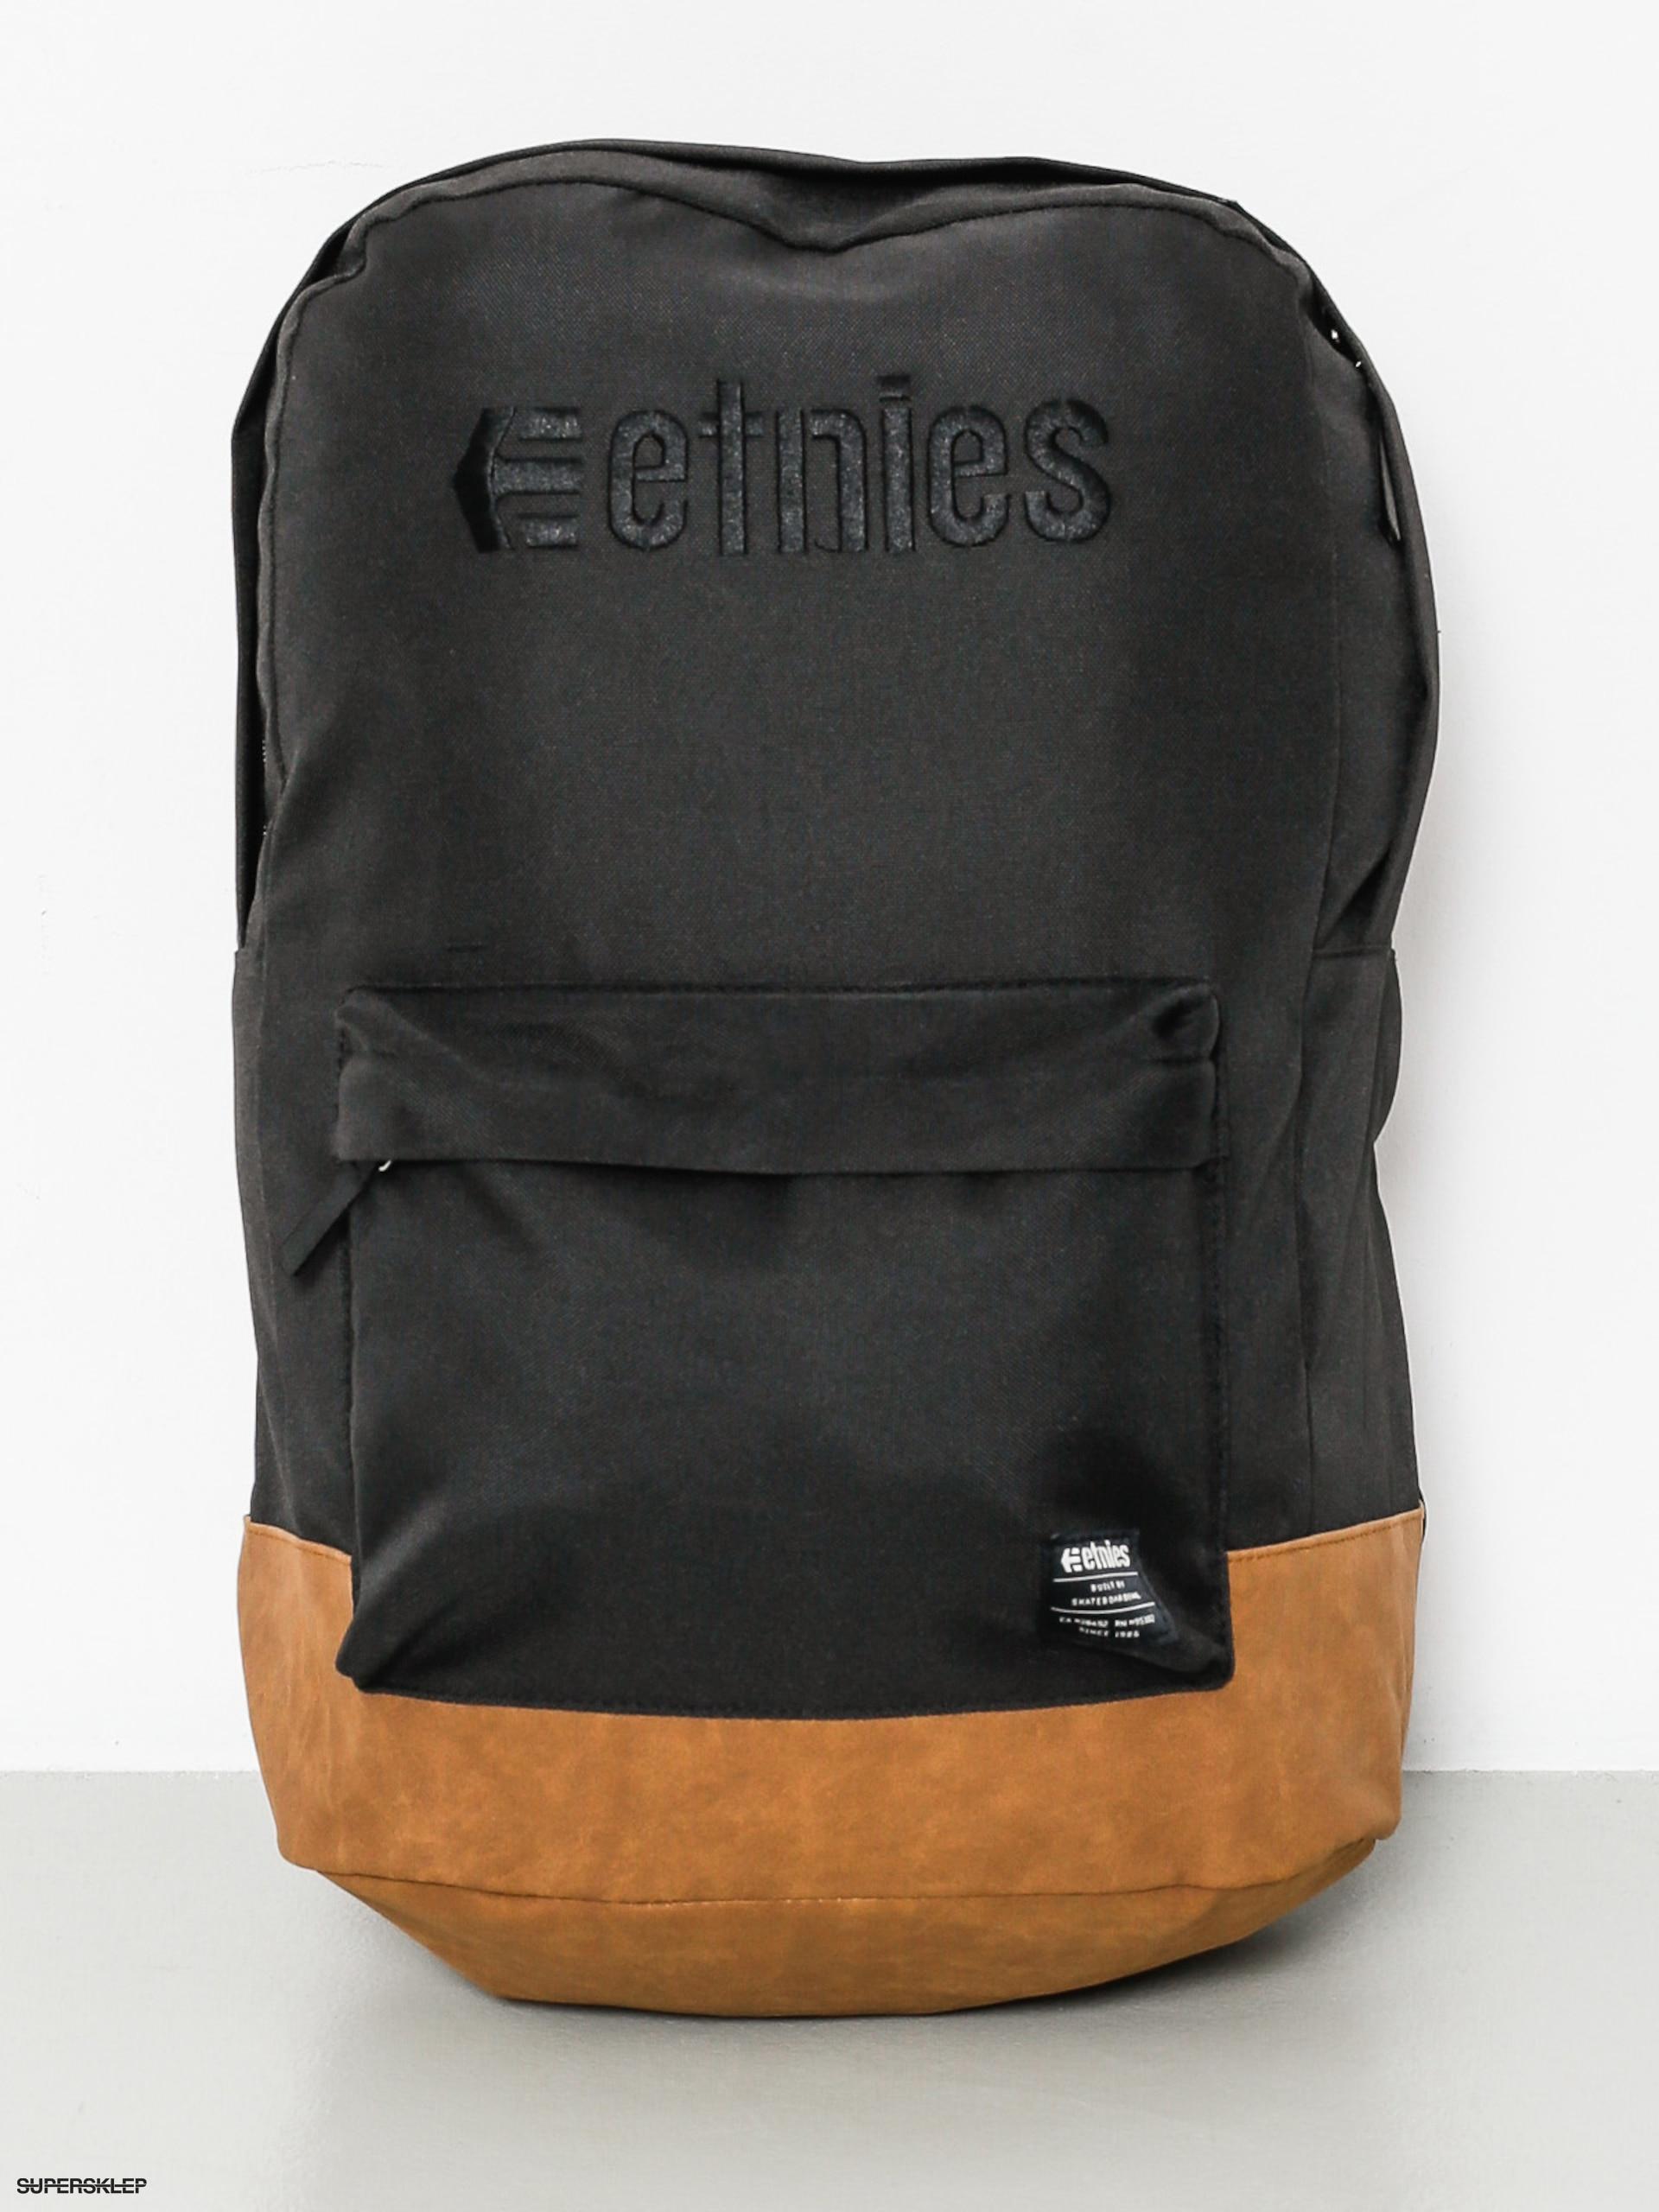 c4caf4df33cb2 Plecak Etnies Etnies Essential (black)